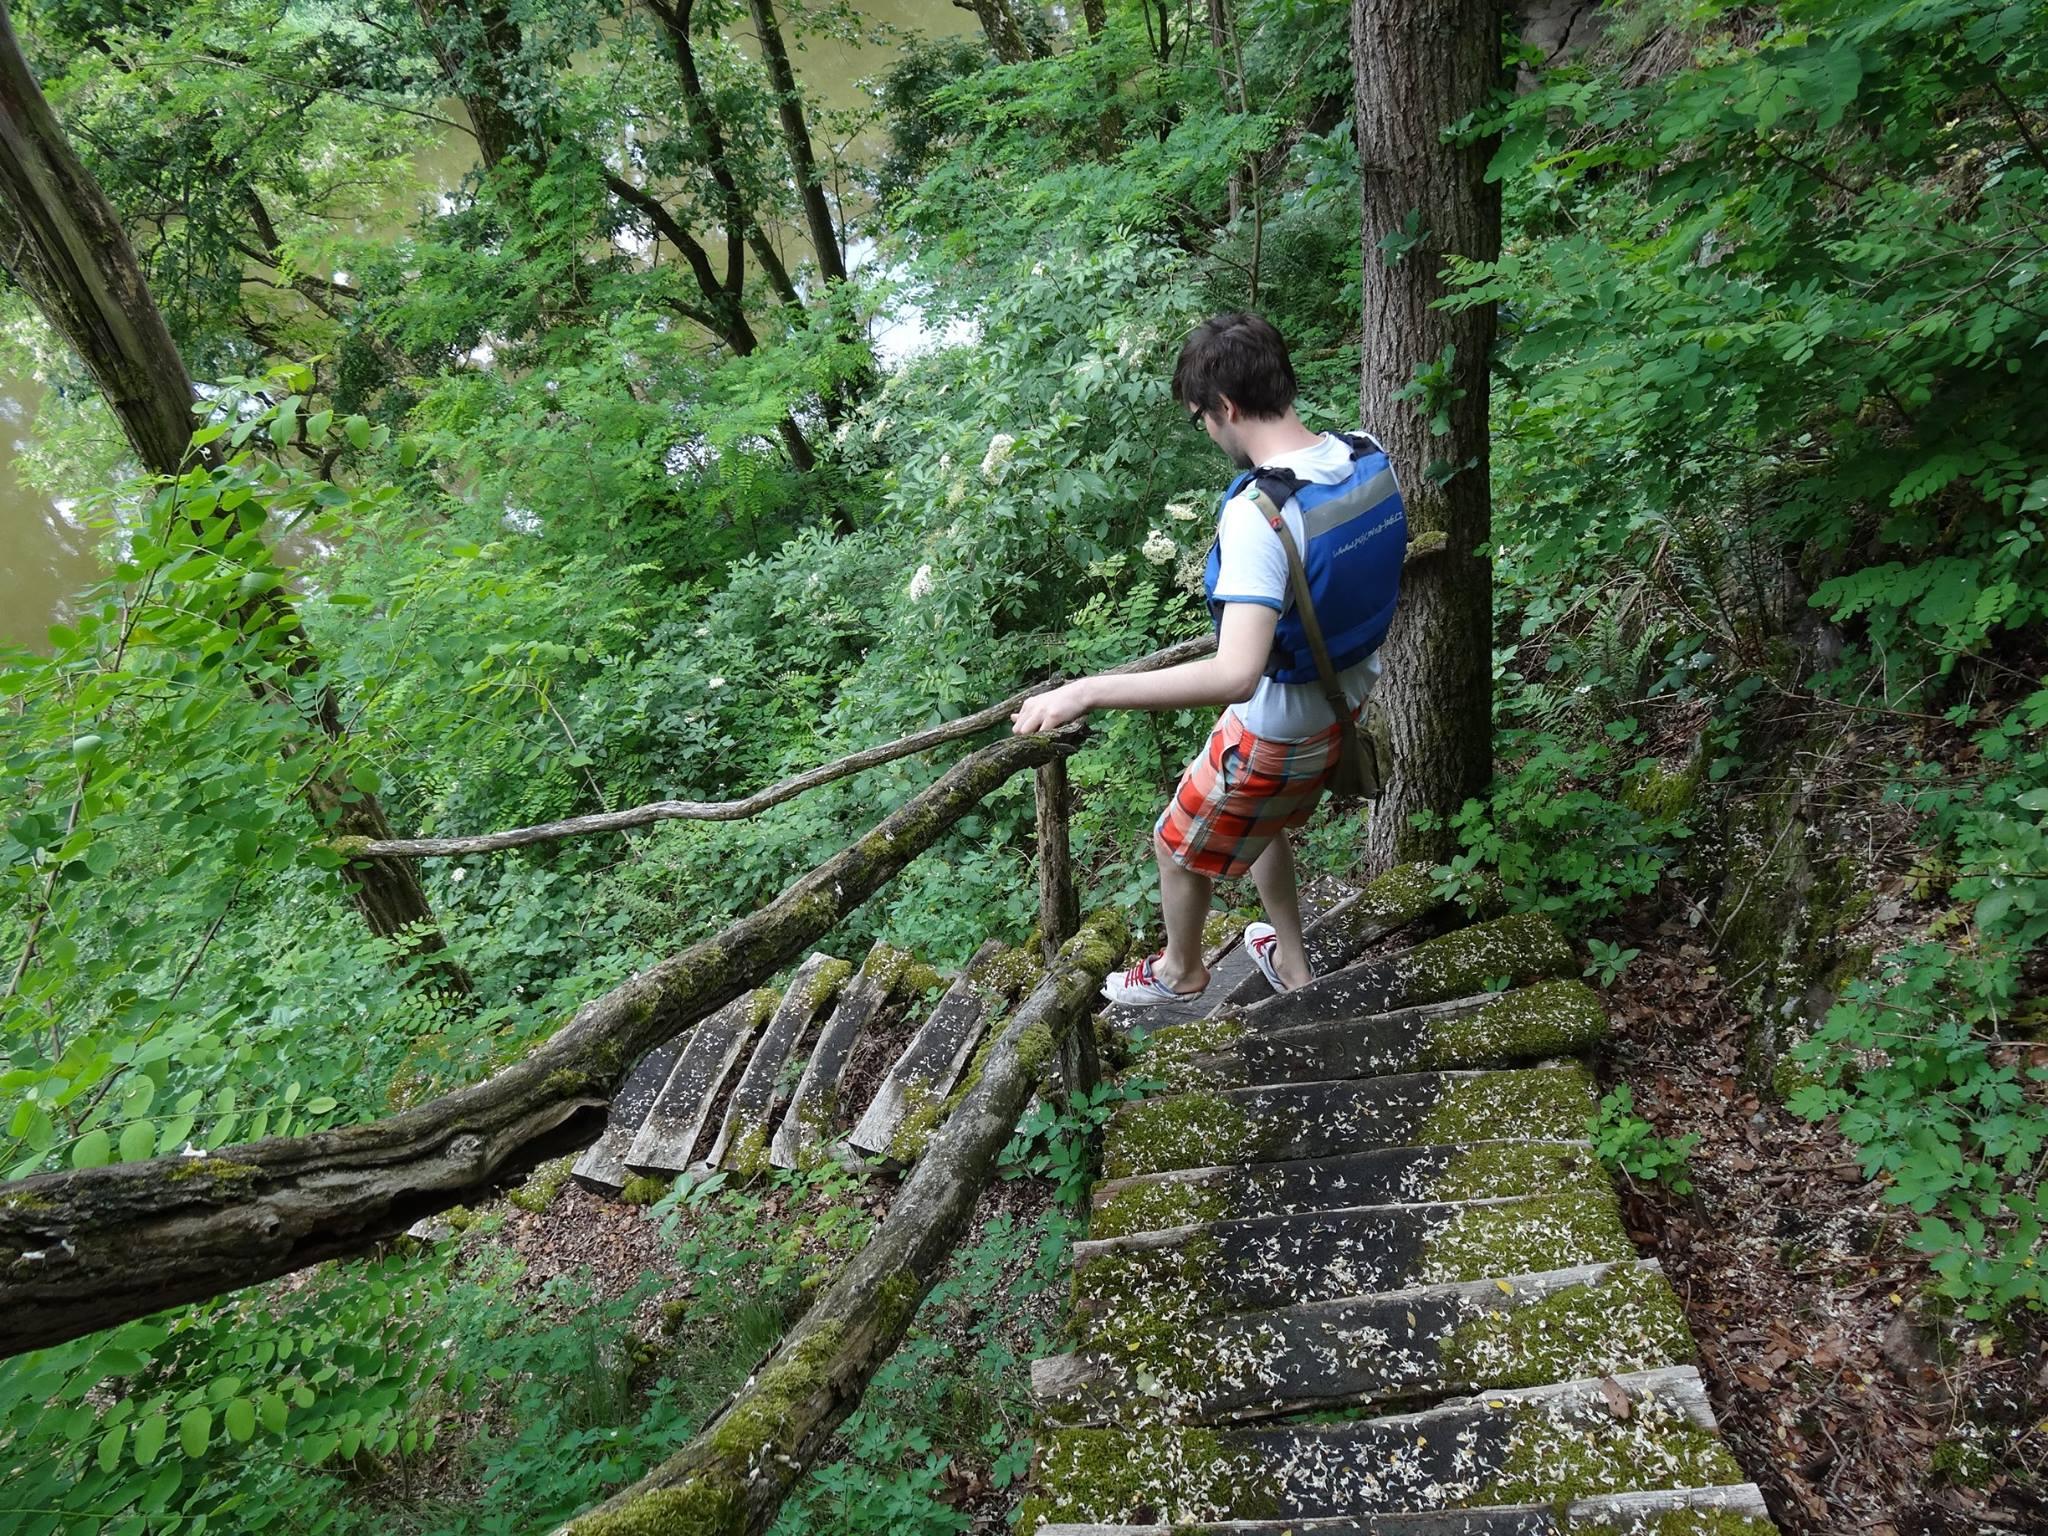 francois hokonono boyfriend wood stairs in forest